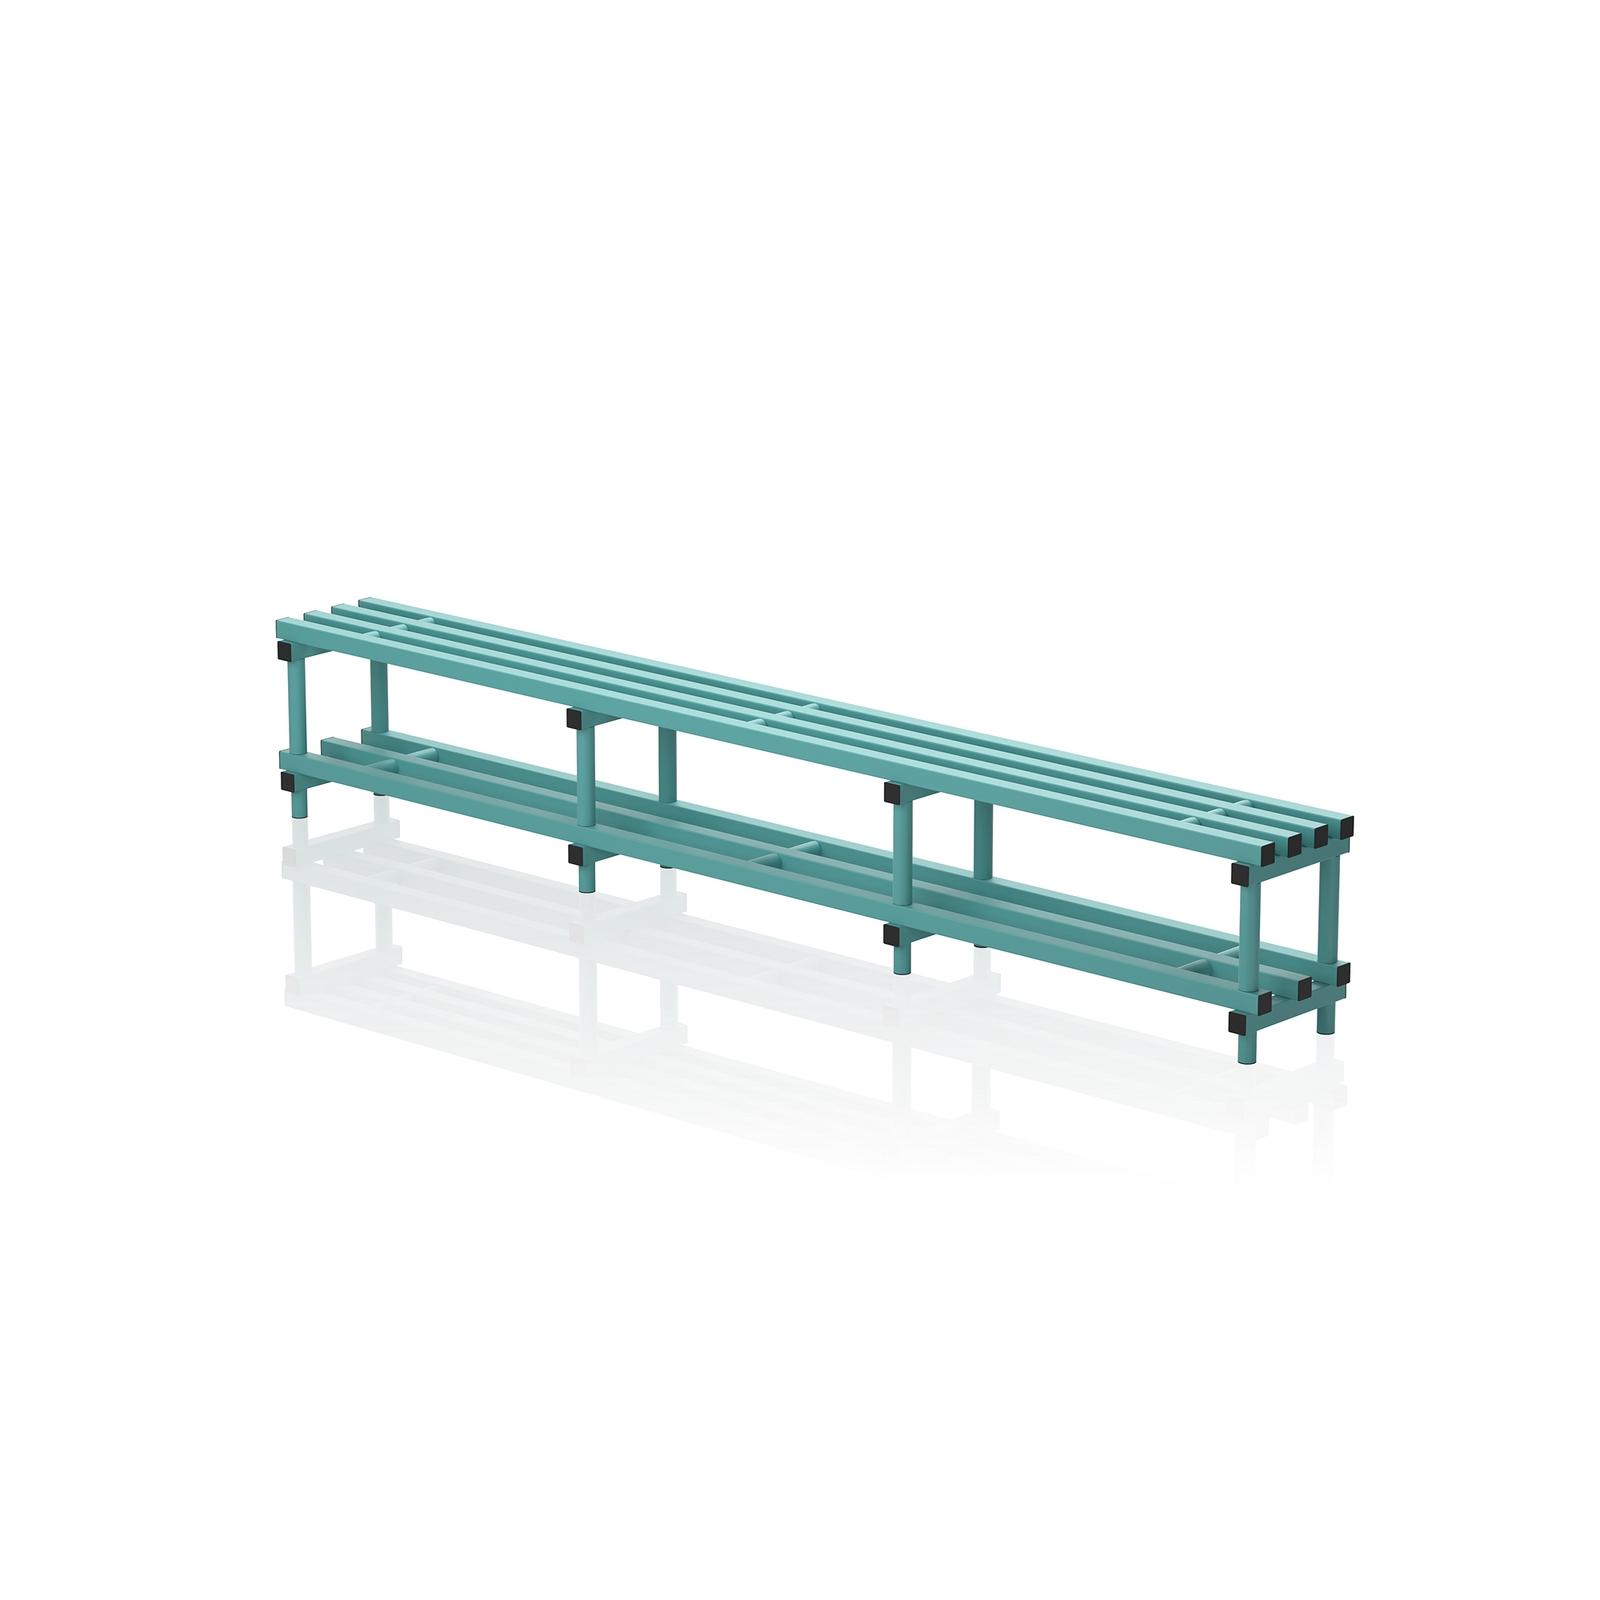 Bench With Bottom Shelf Xlarge Aqua